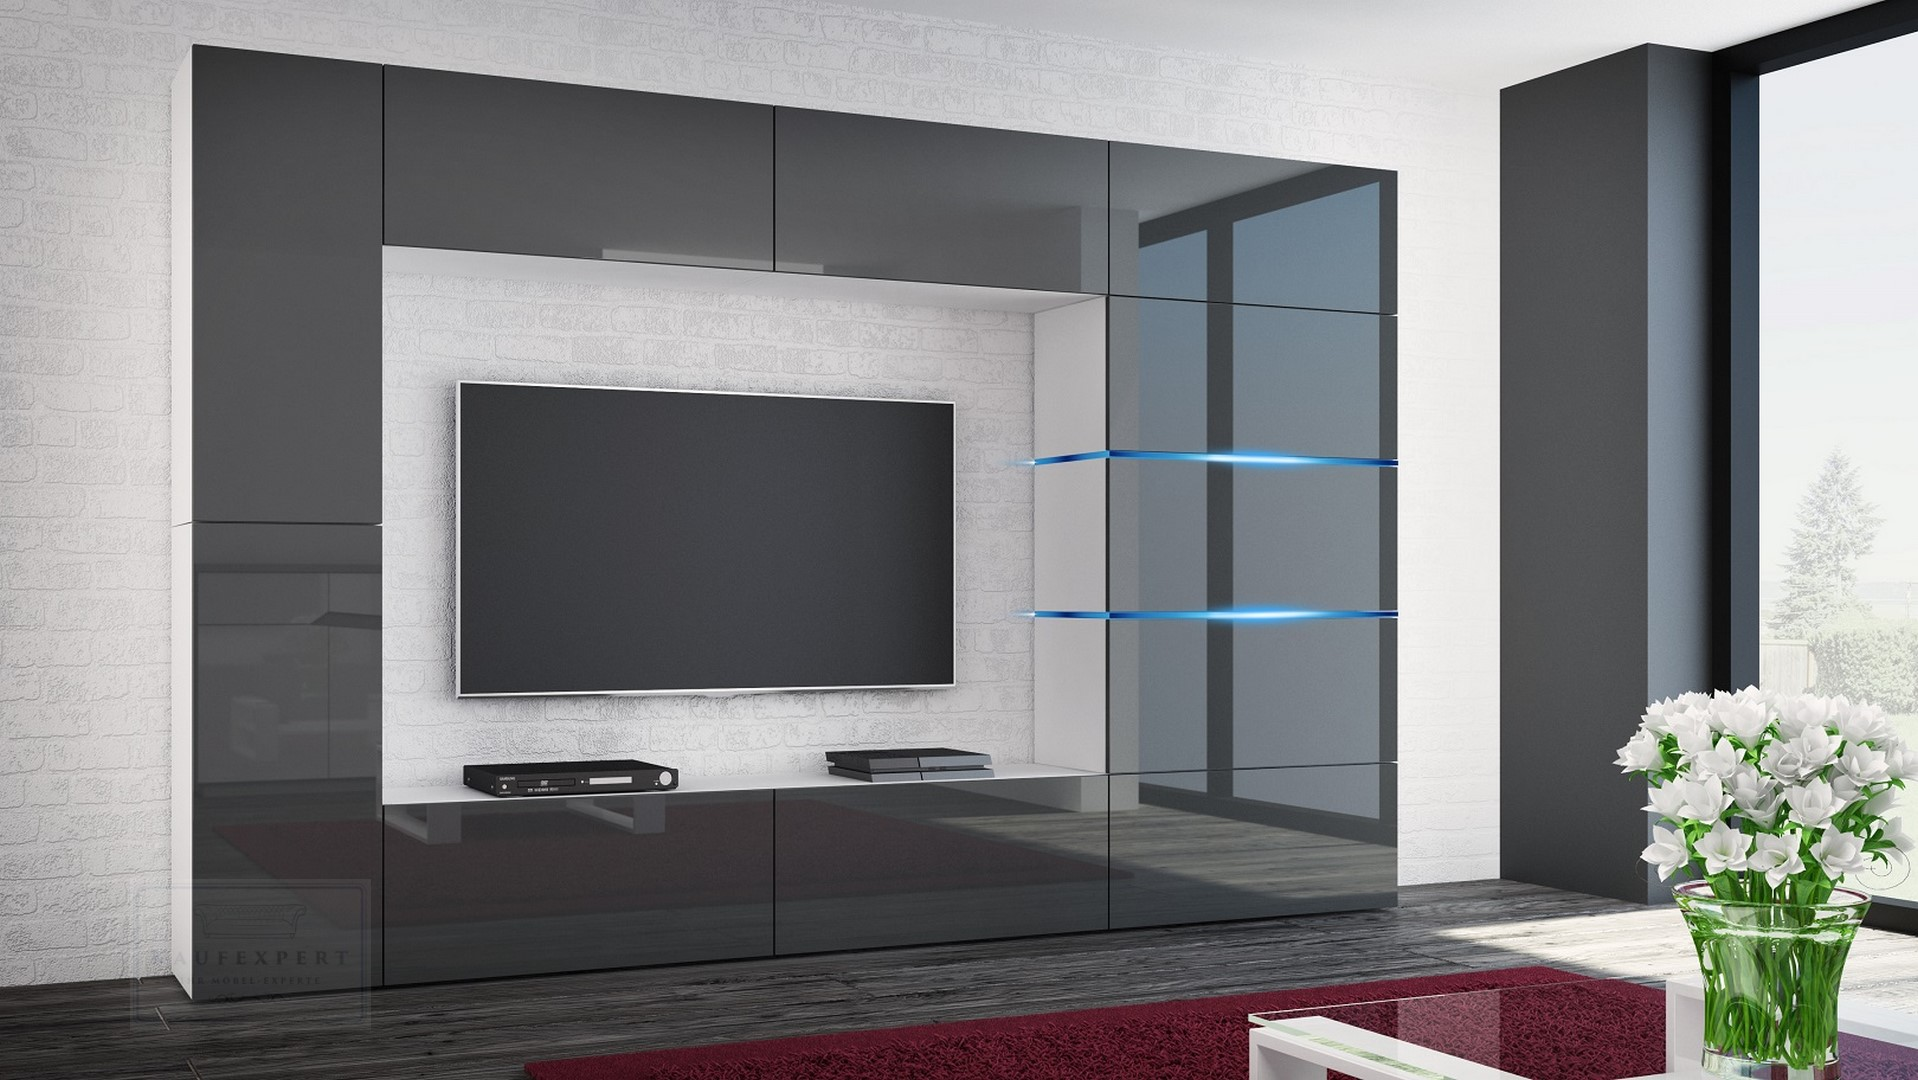 Wohnwand Shadow Grau Hochglanz Weiss 285 Cm Mediawand Anbauwand Medienwand Design Modern Led Beleuchtung Mdf Hochglanz Stehend Tv Wand